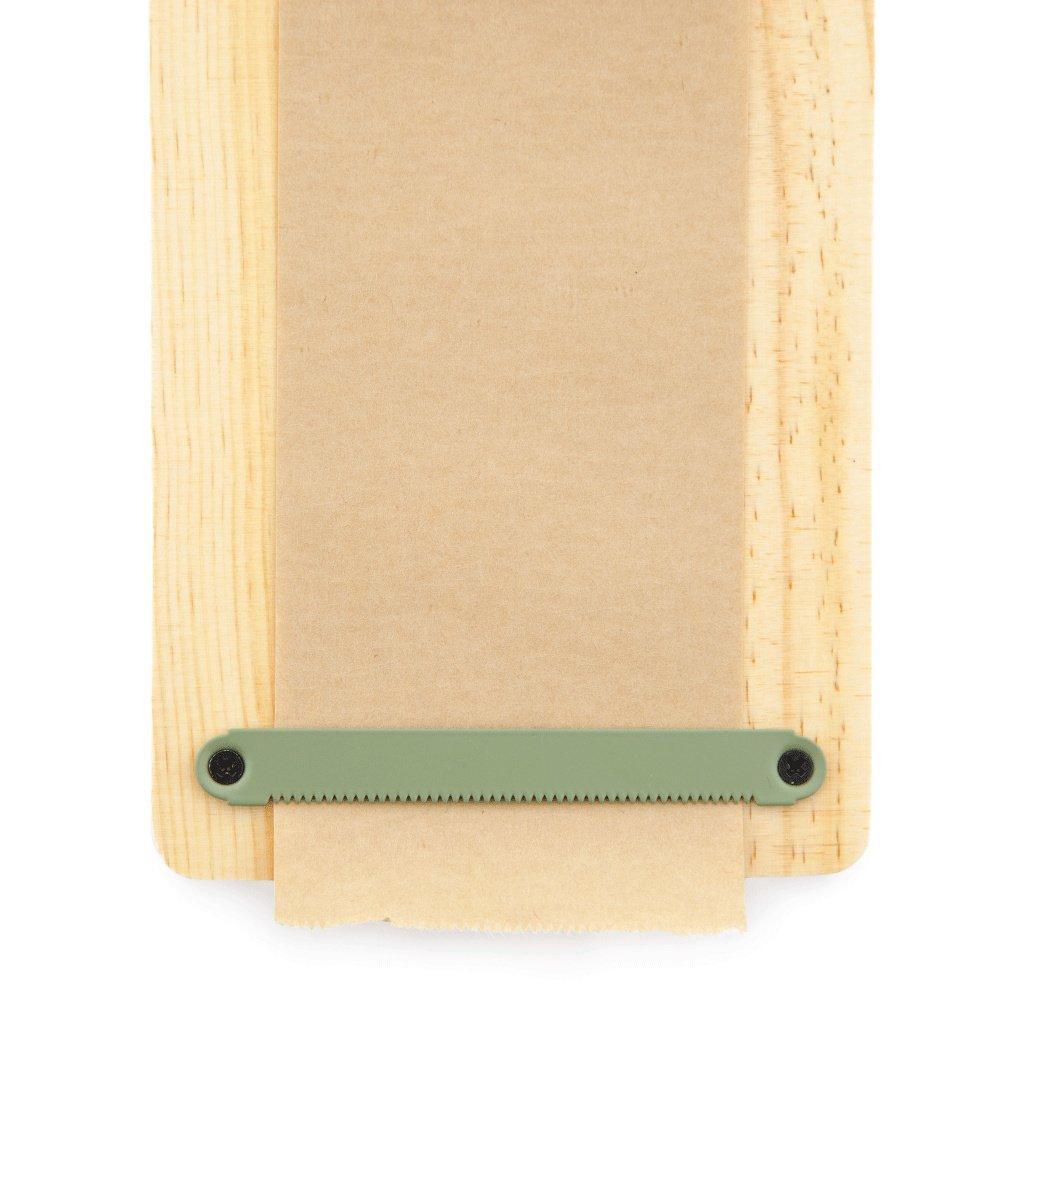 Kraft Paper Roller S - Green-6